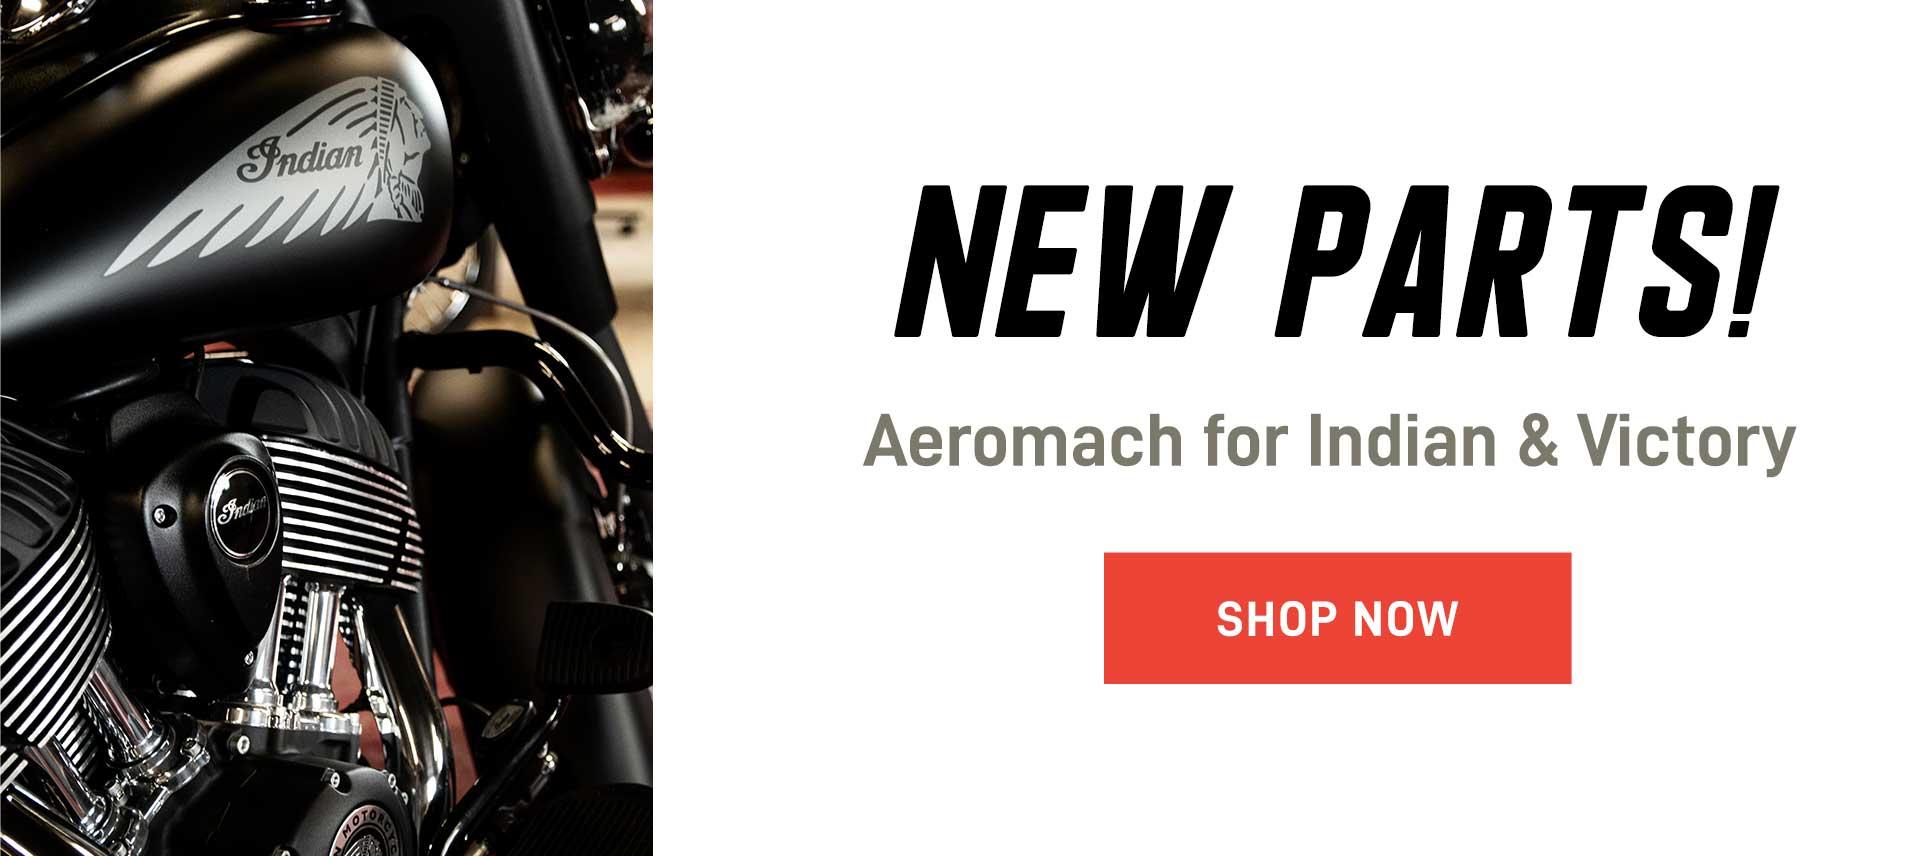 billet-proof-website-ad-aeromach-1.jpg